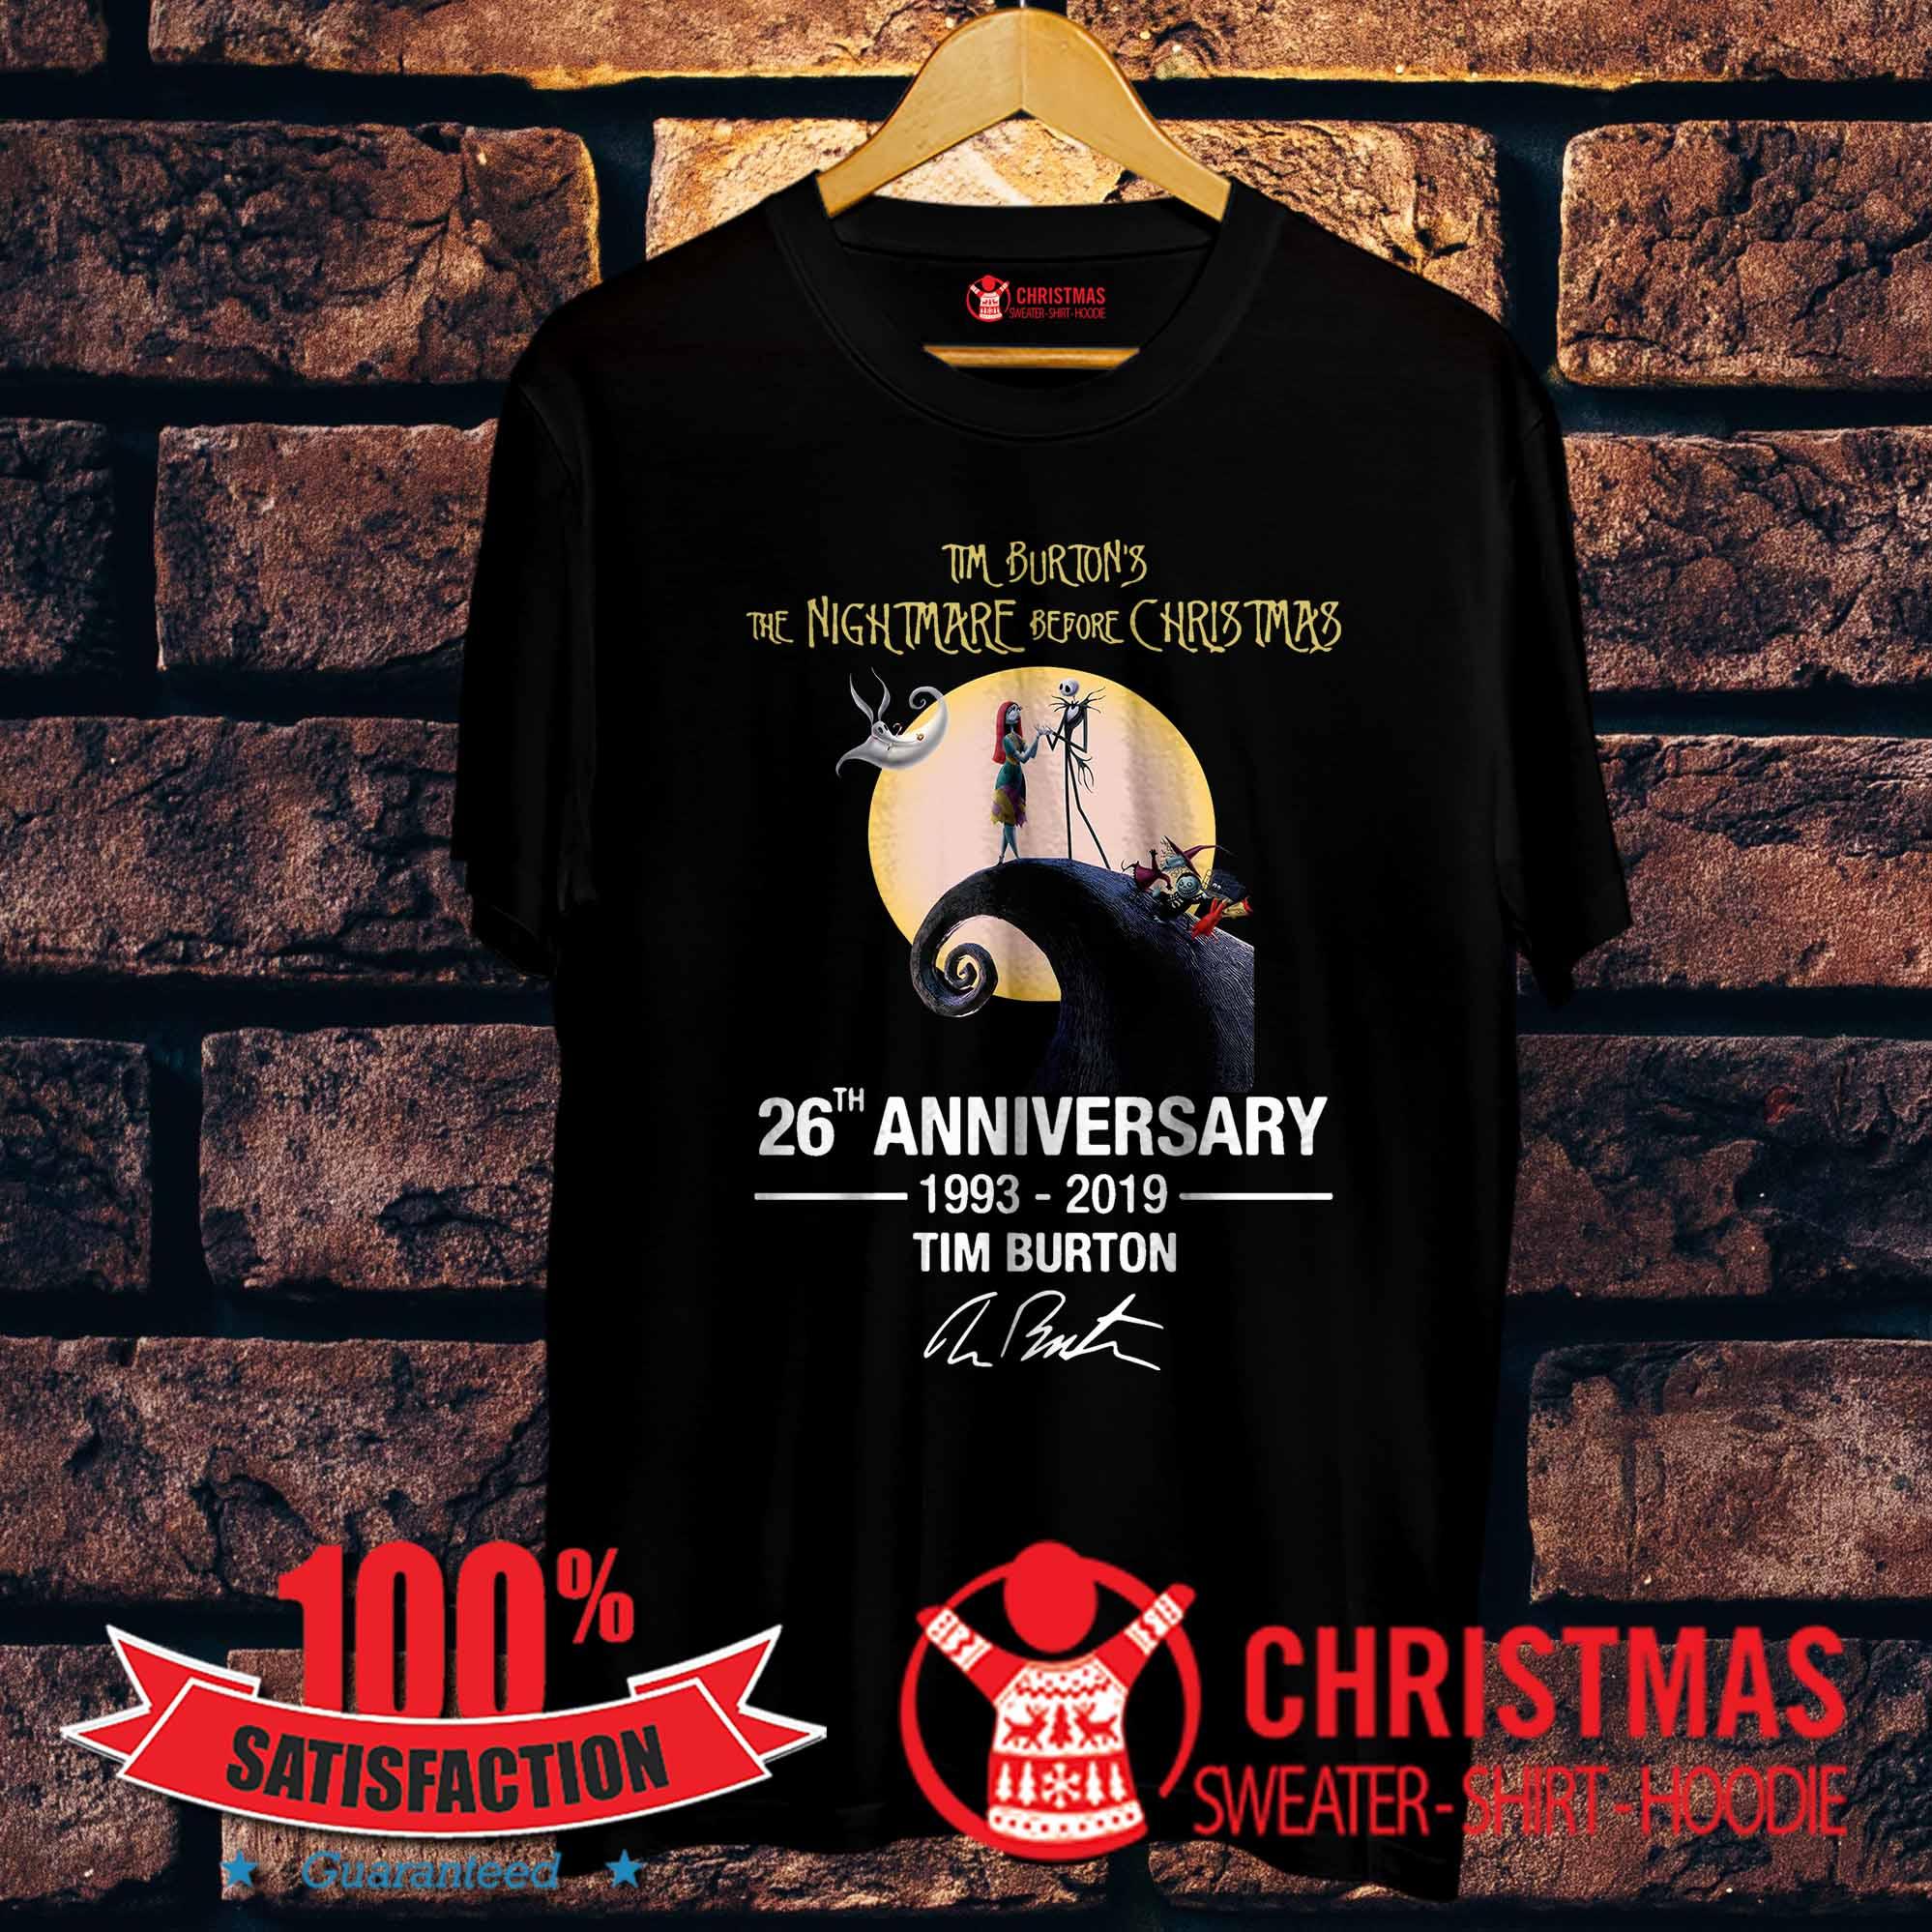 f89fd8c0 Tim Burton's The Nightmare before Christmas 26th anniversary 1993 2019 shirt